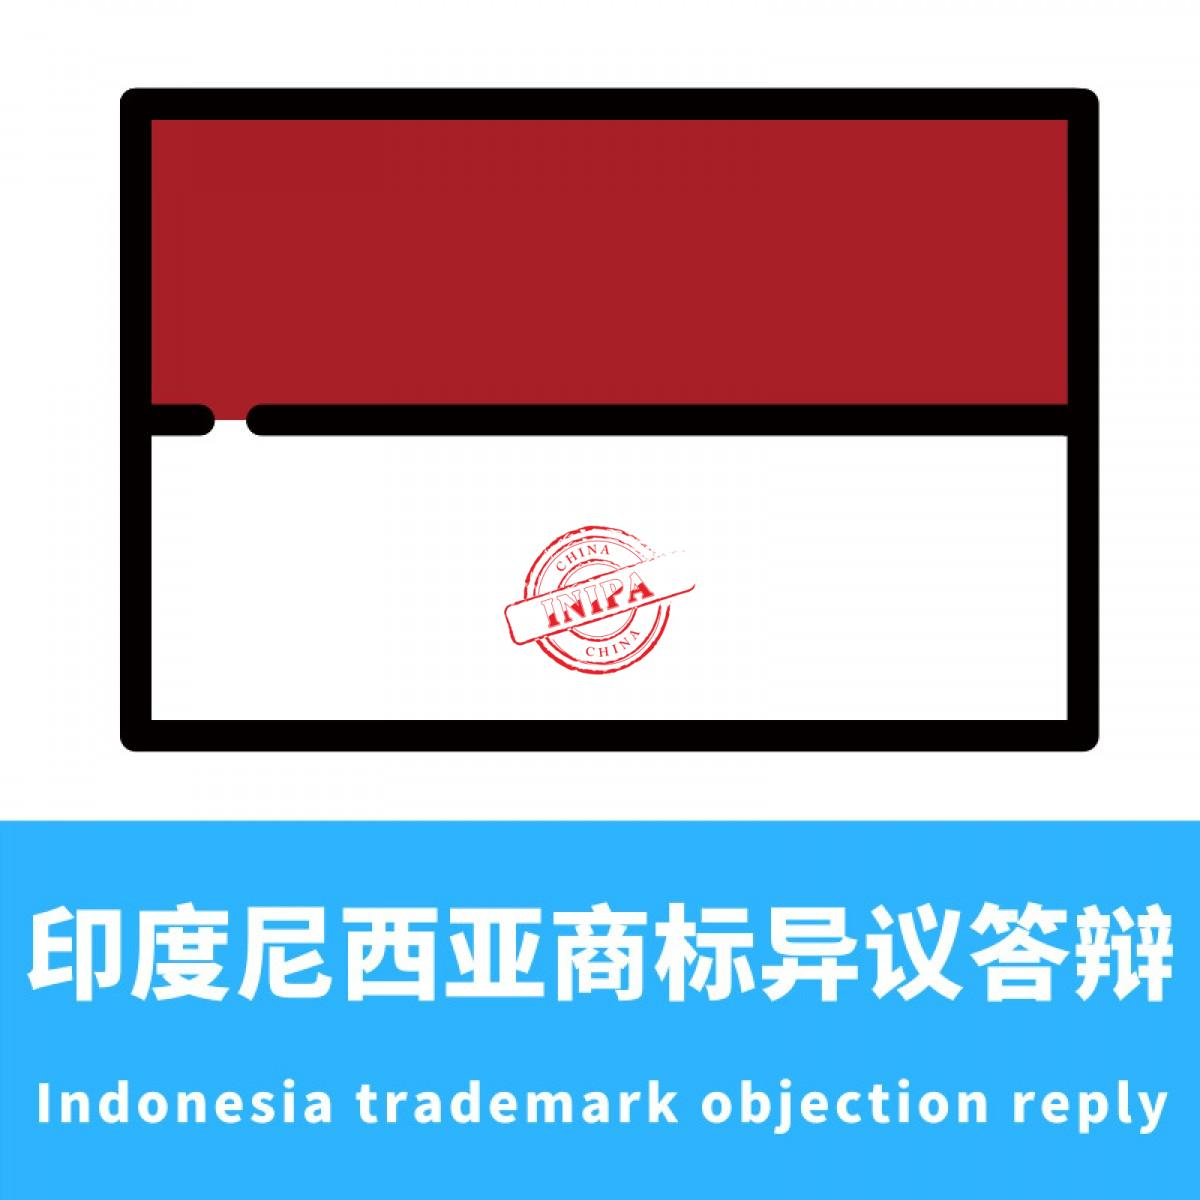 印度尼西亚商标异议答辩/Indonesia trademark objection reply